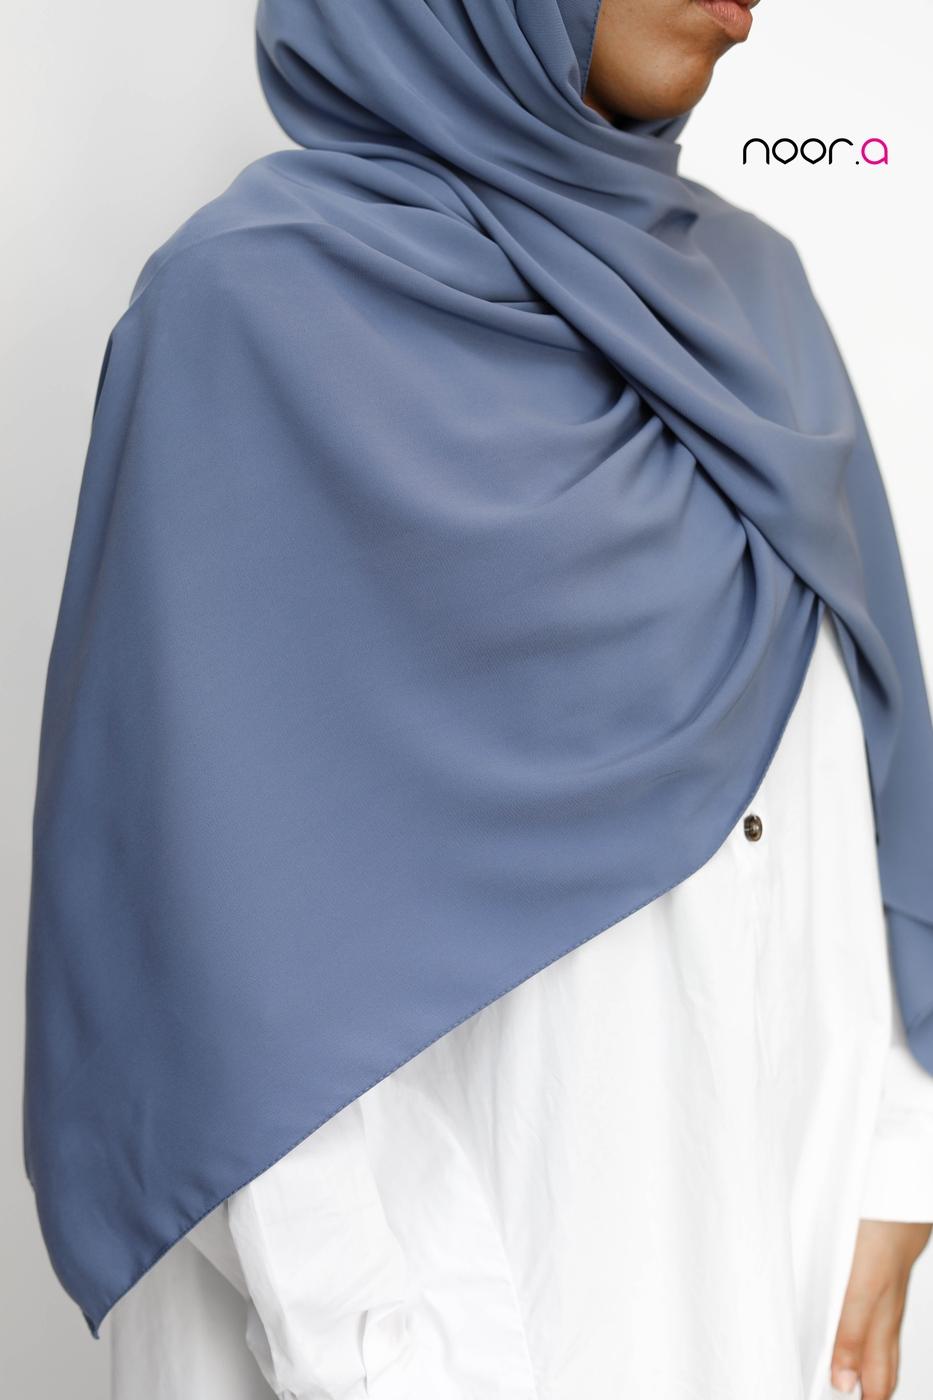 hijab-soie-de-medine-bleu-bleuet